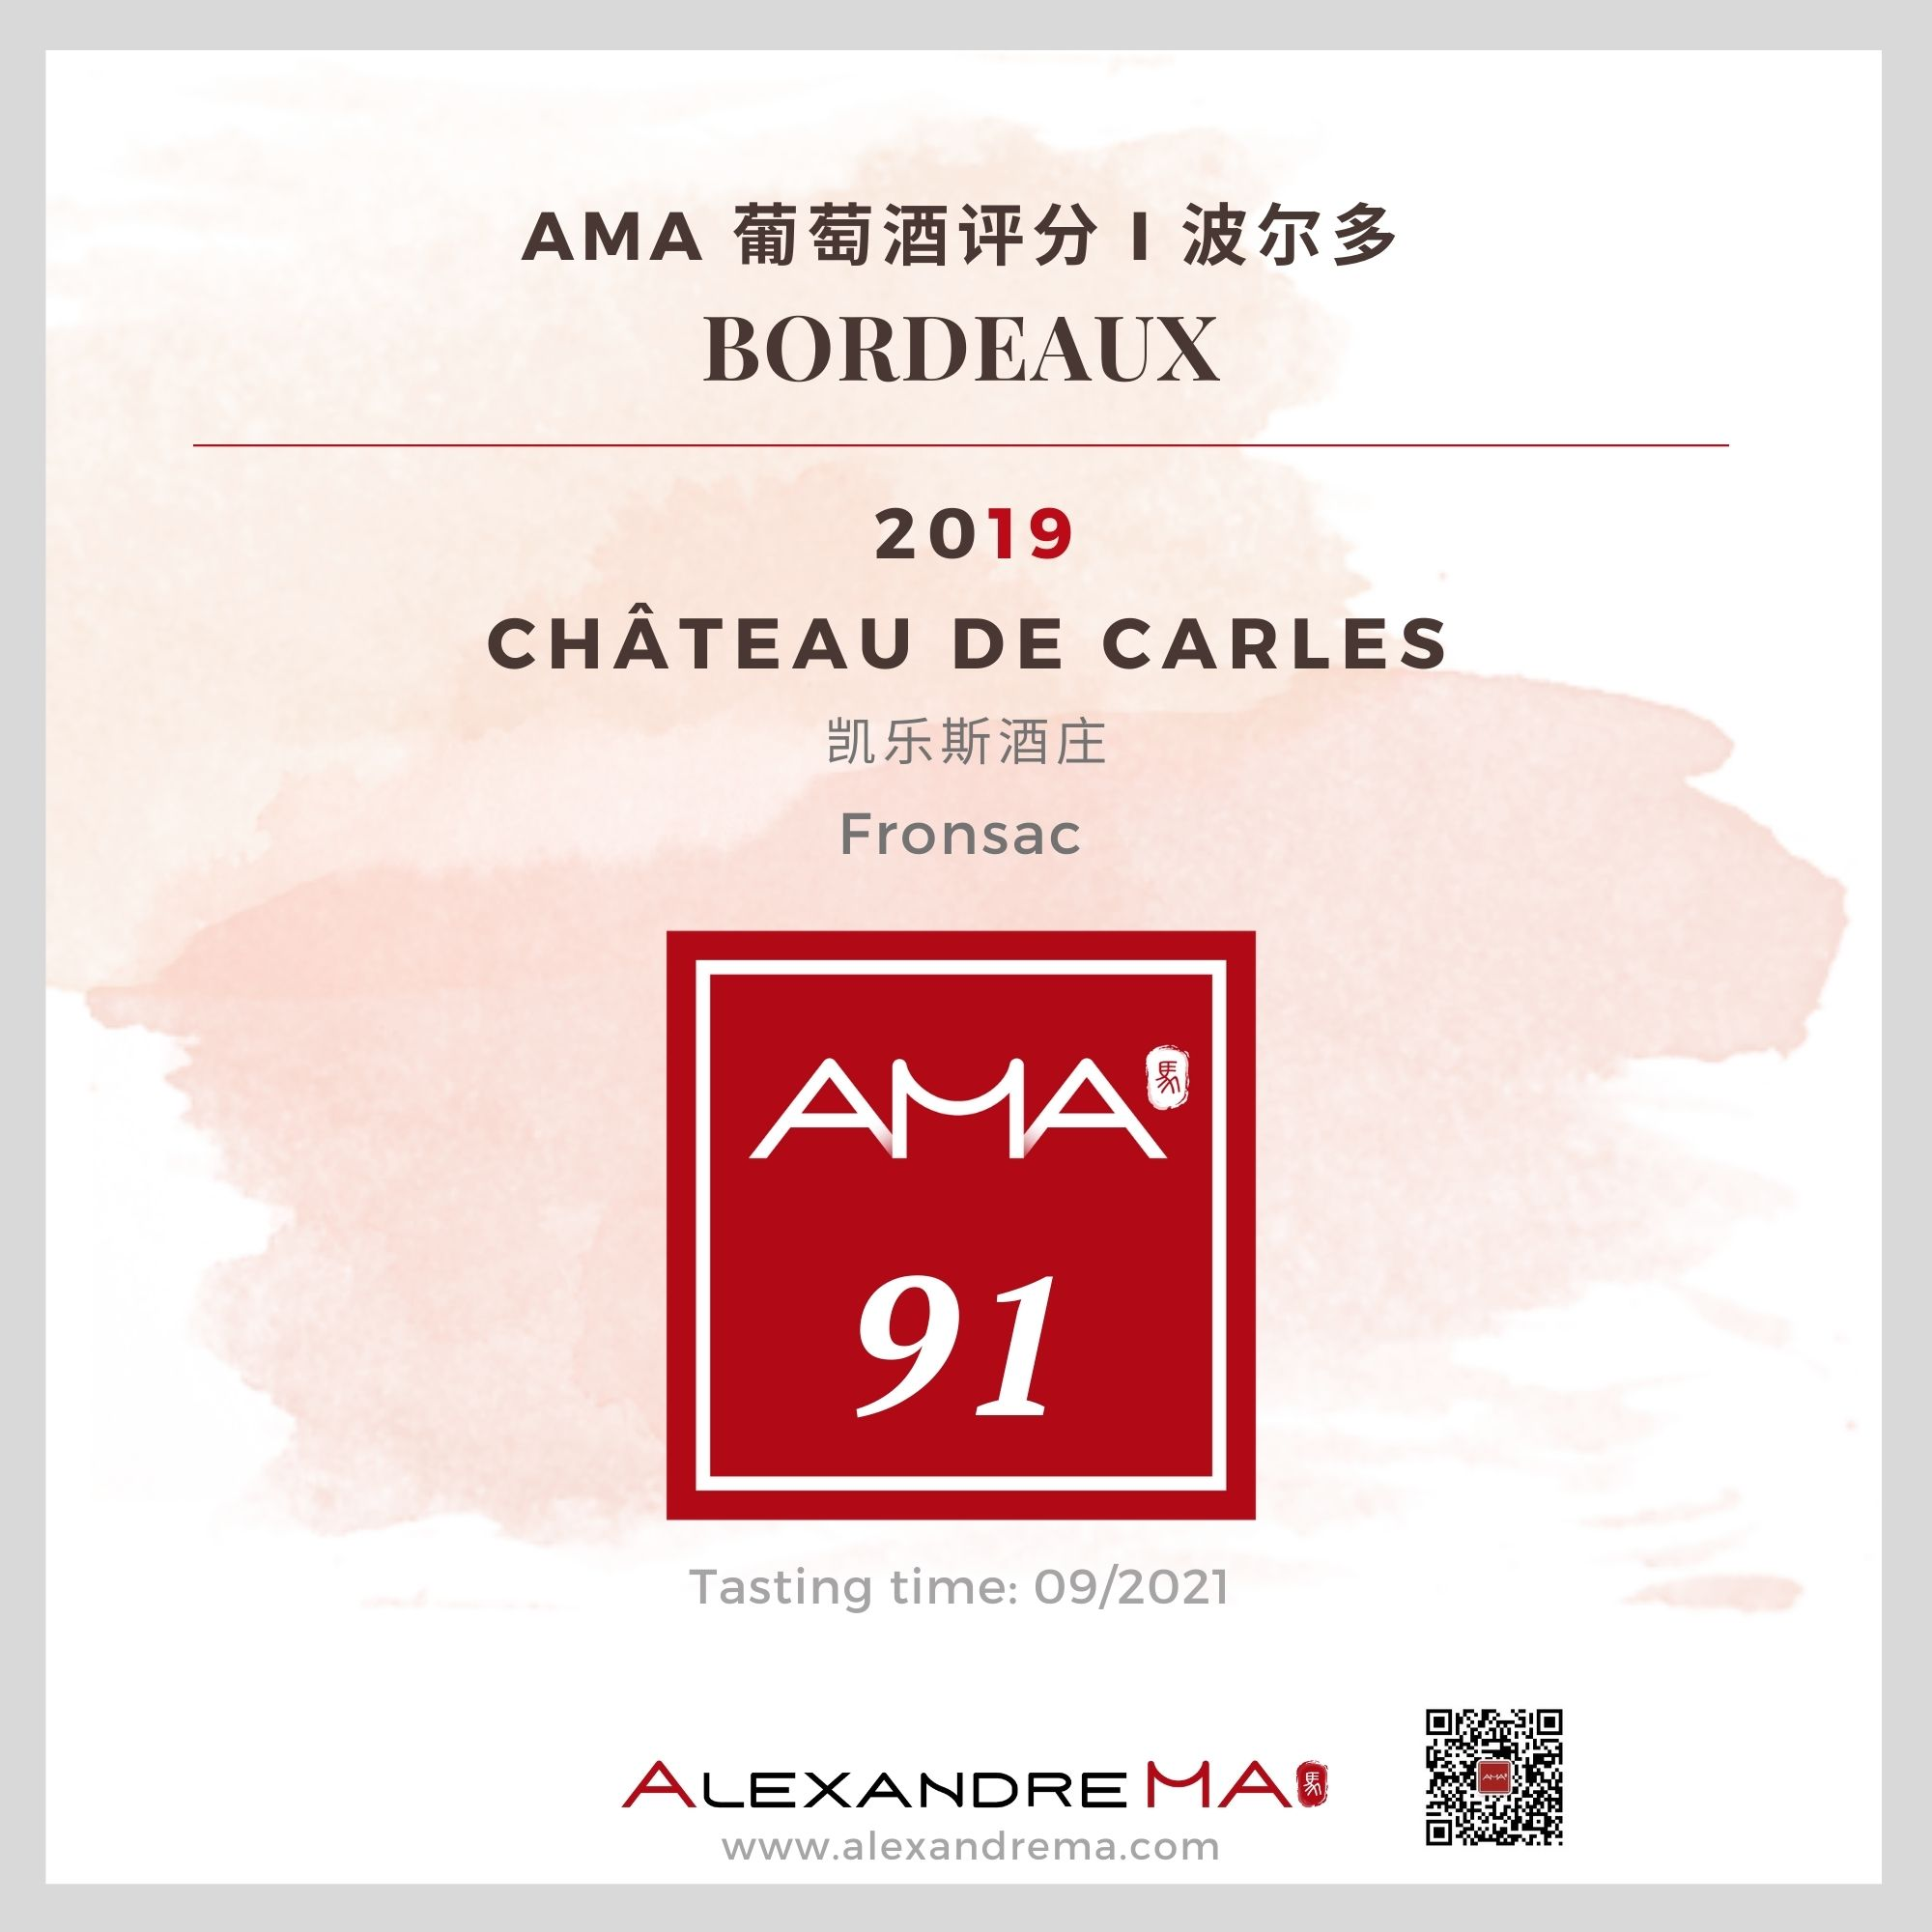 Château de Carles 2019 凯乐斯酒庄 - Alexandre Ma